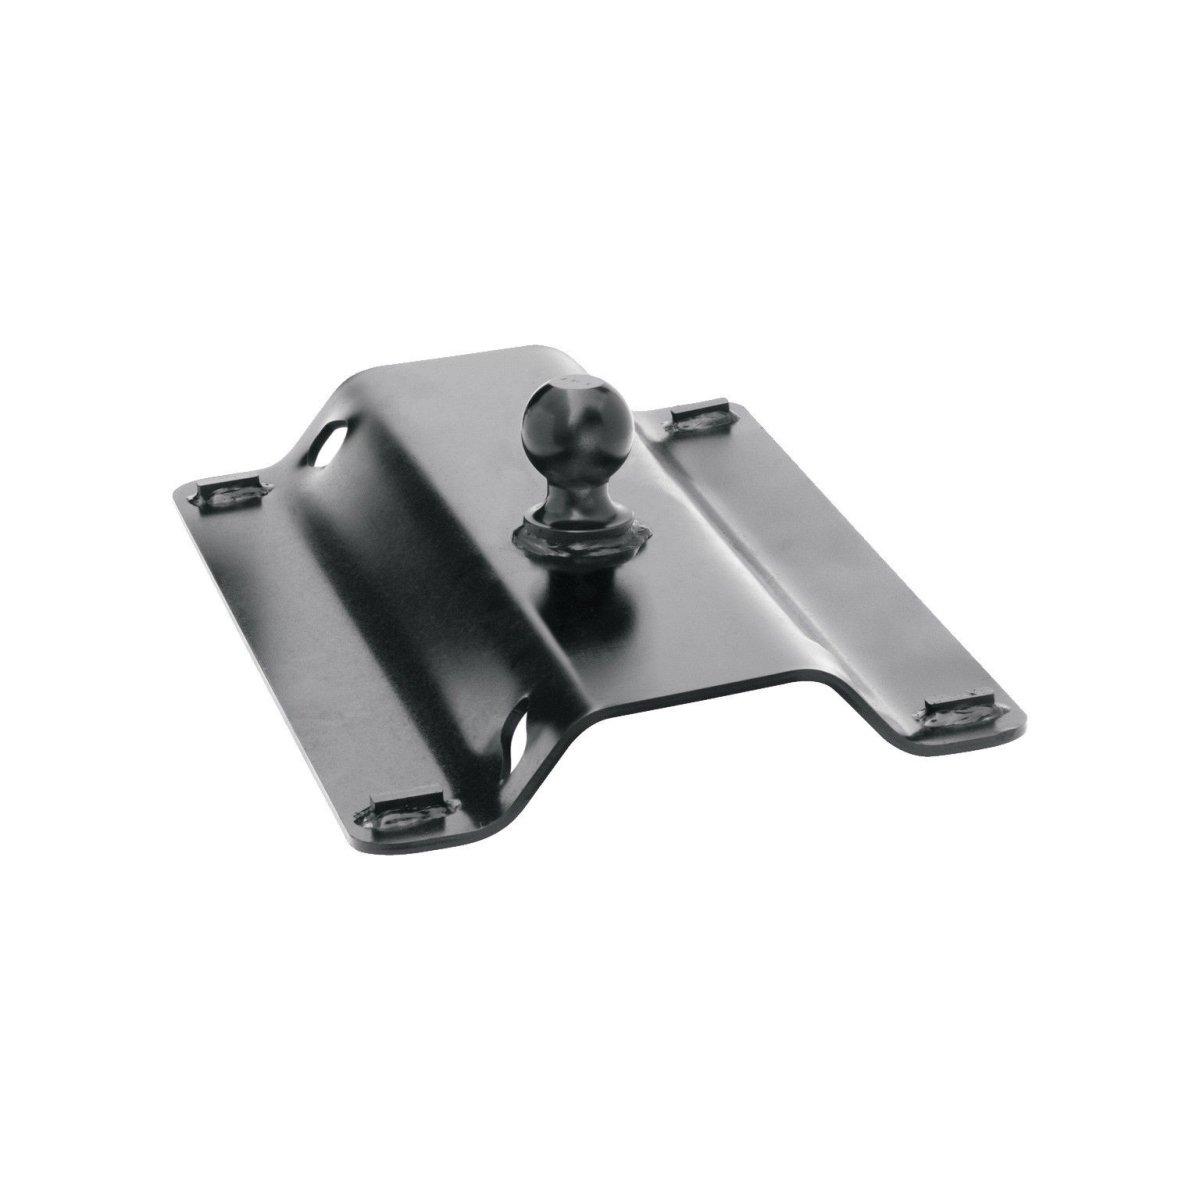 Reese 49080RTL Gooseneck Plate (Requires Rails Installation Kit #30035)